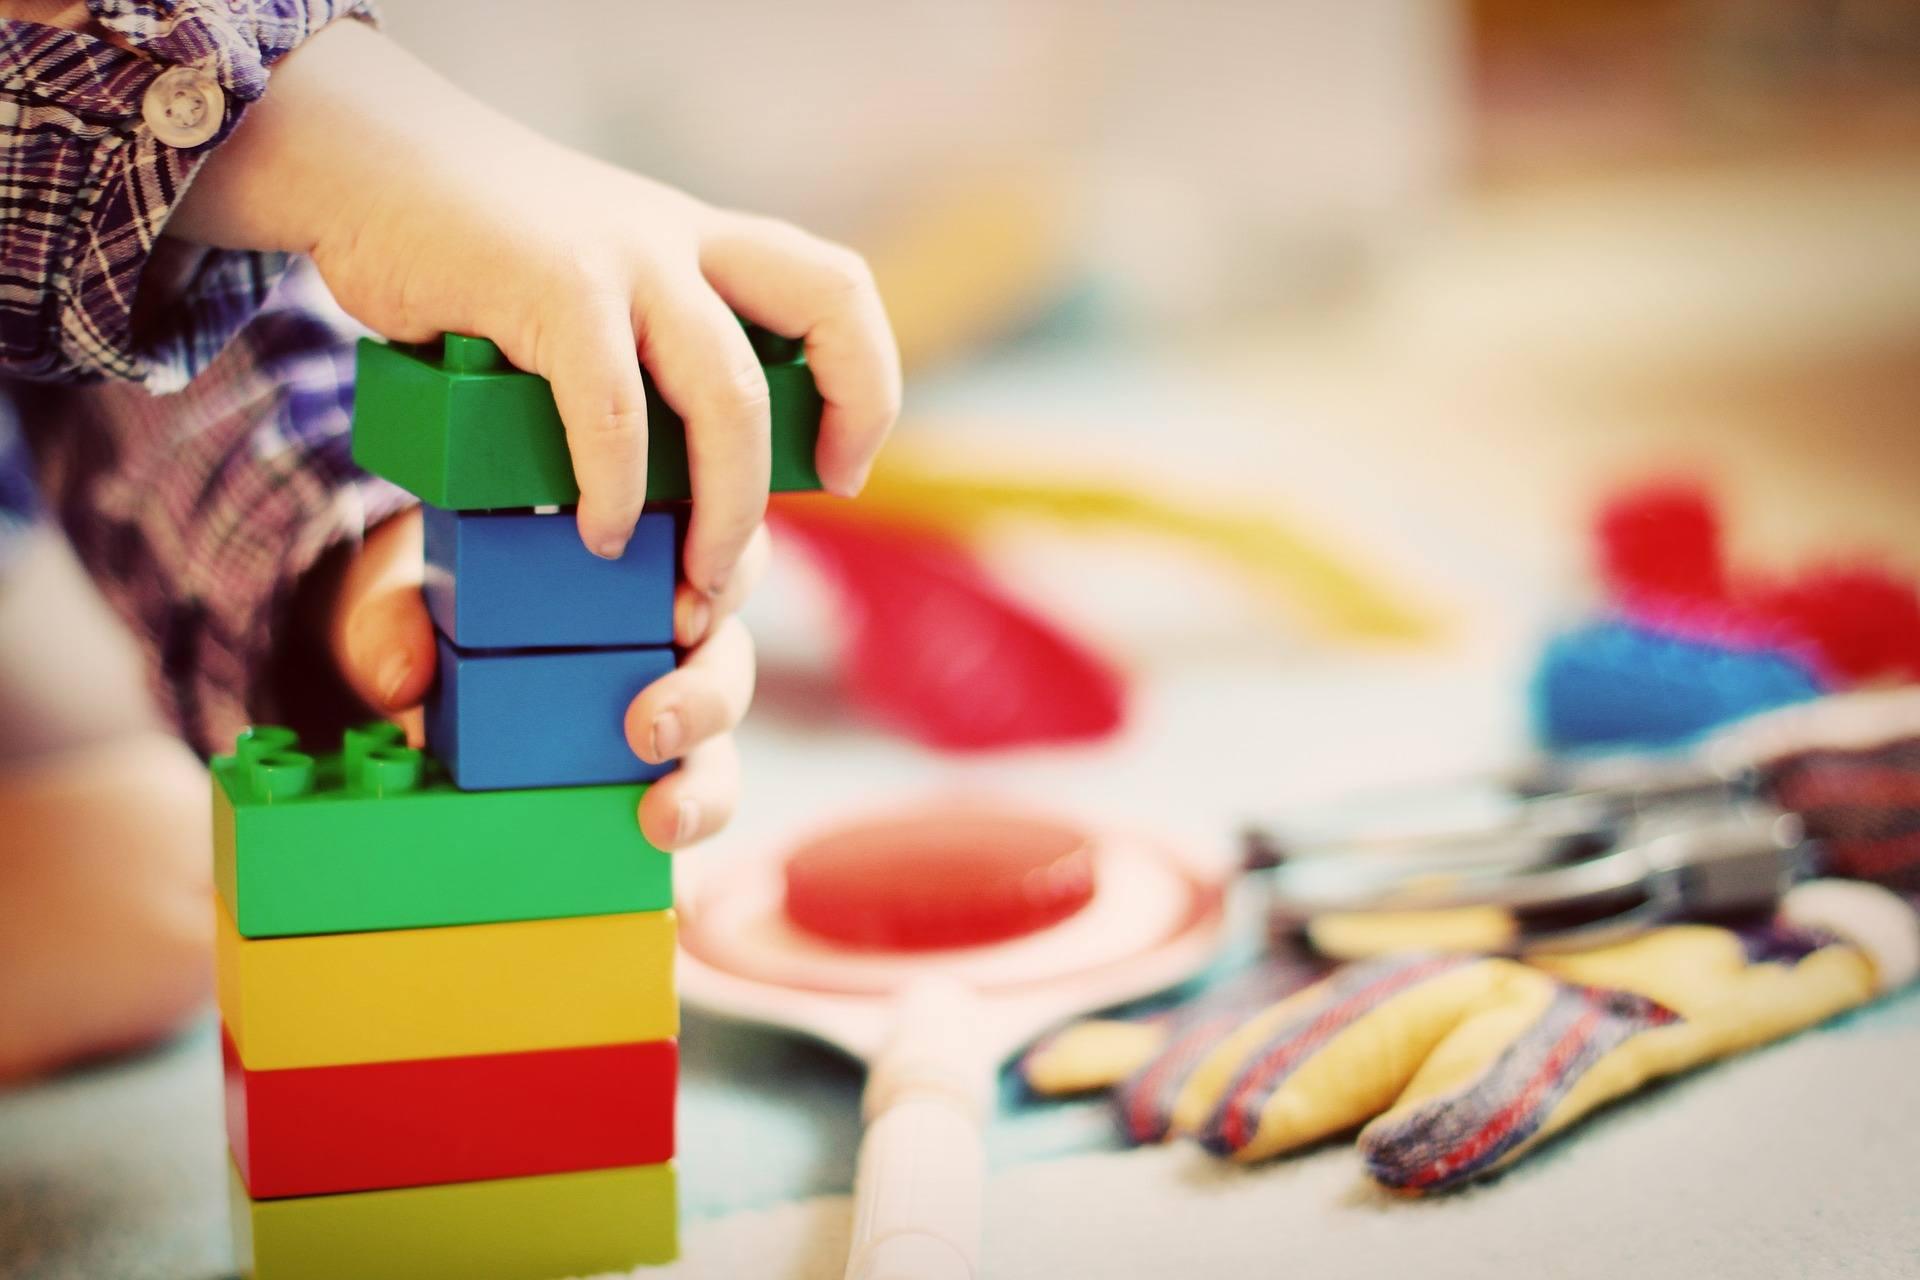 Design per bambini - LEGO